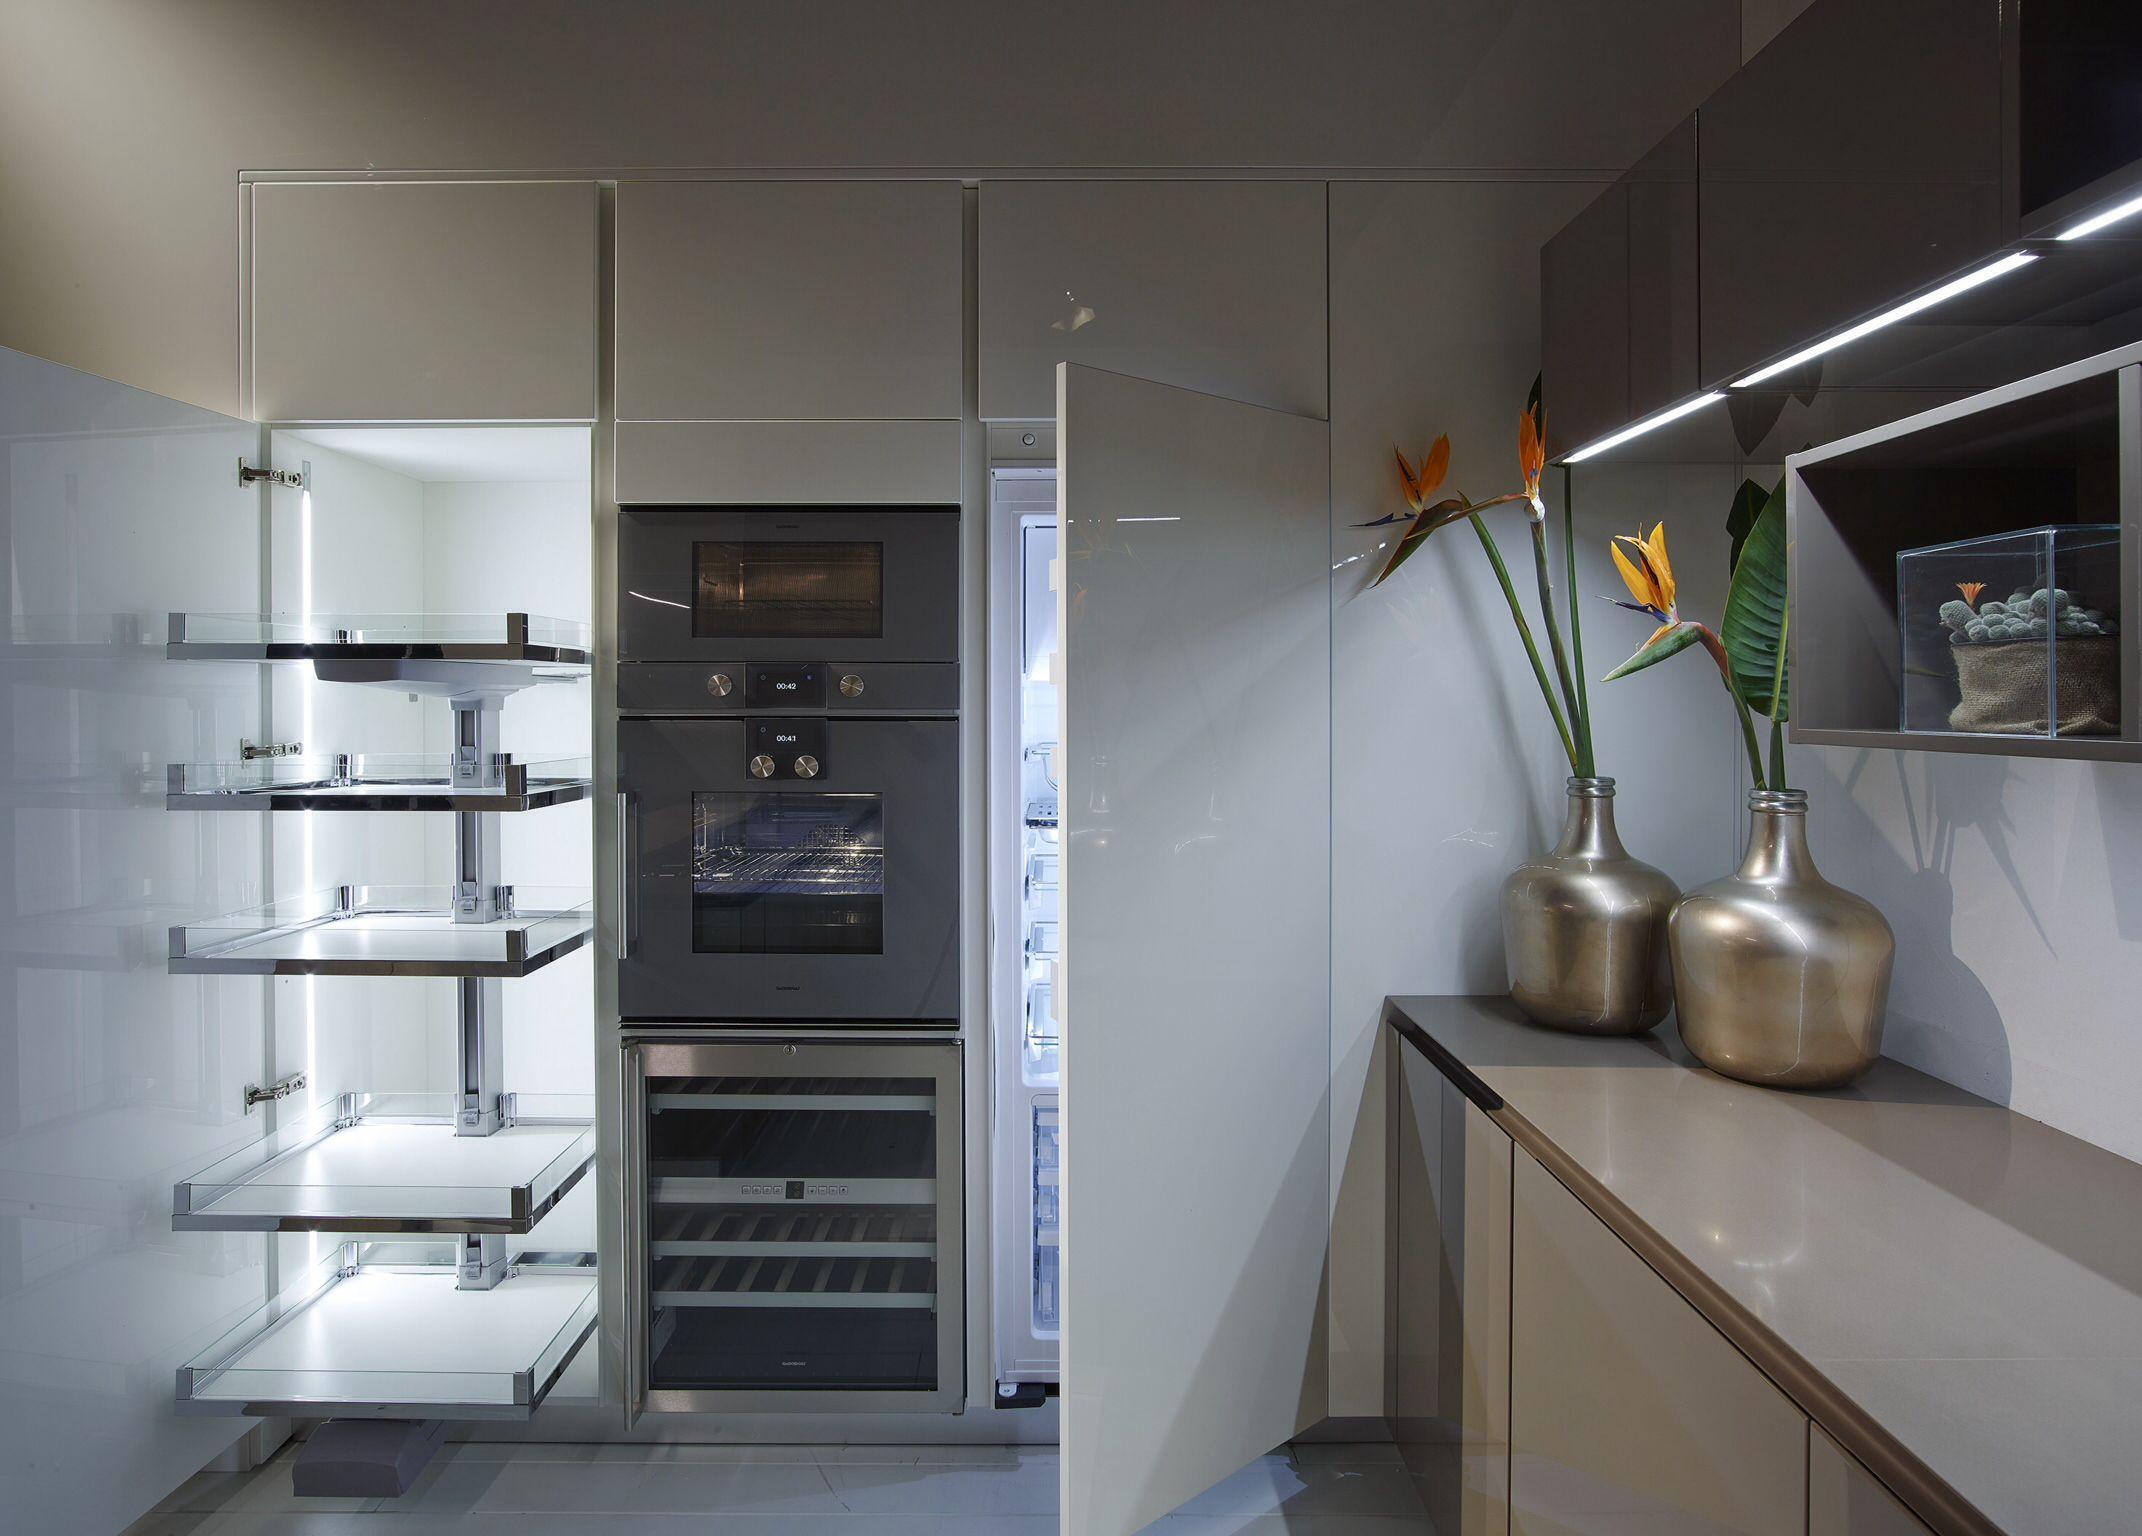 Rifra Cucina Milano 2014 Fly | Cucine